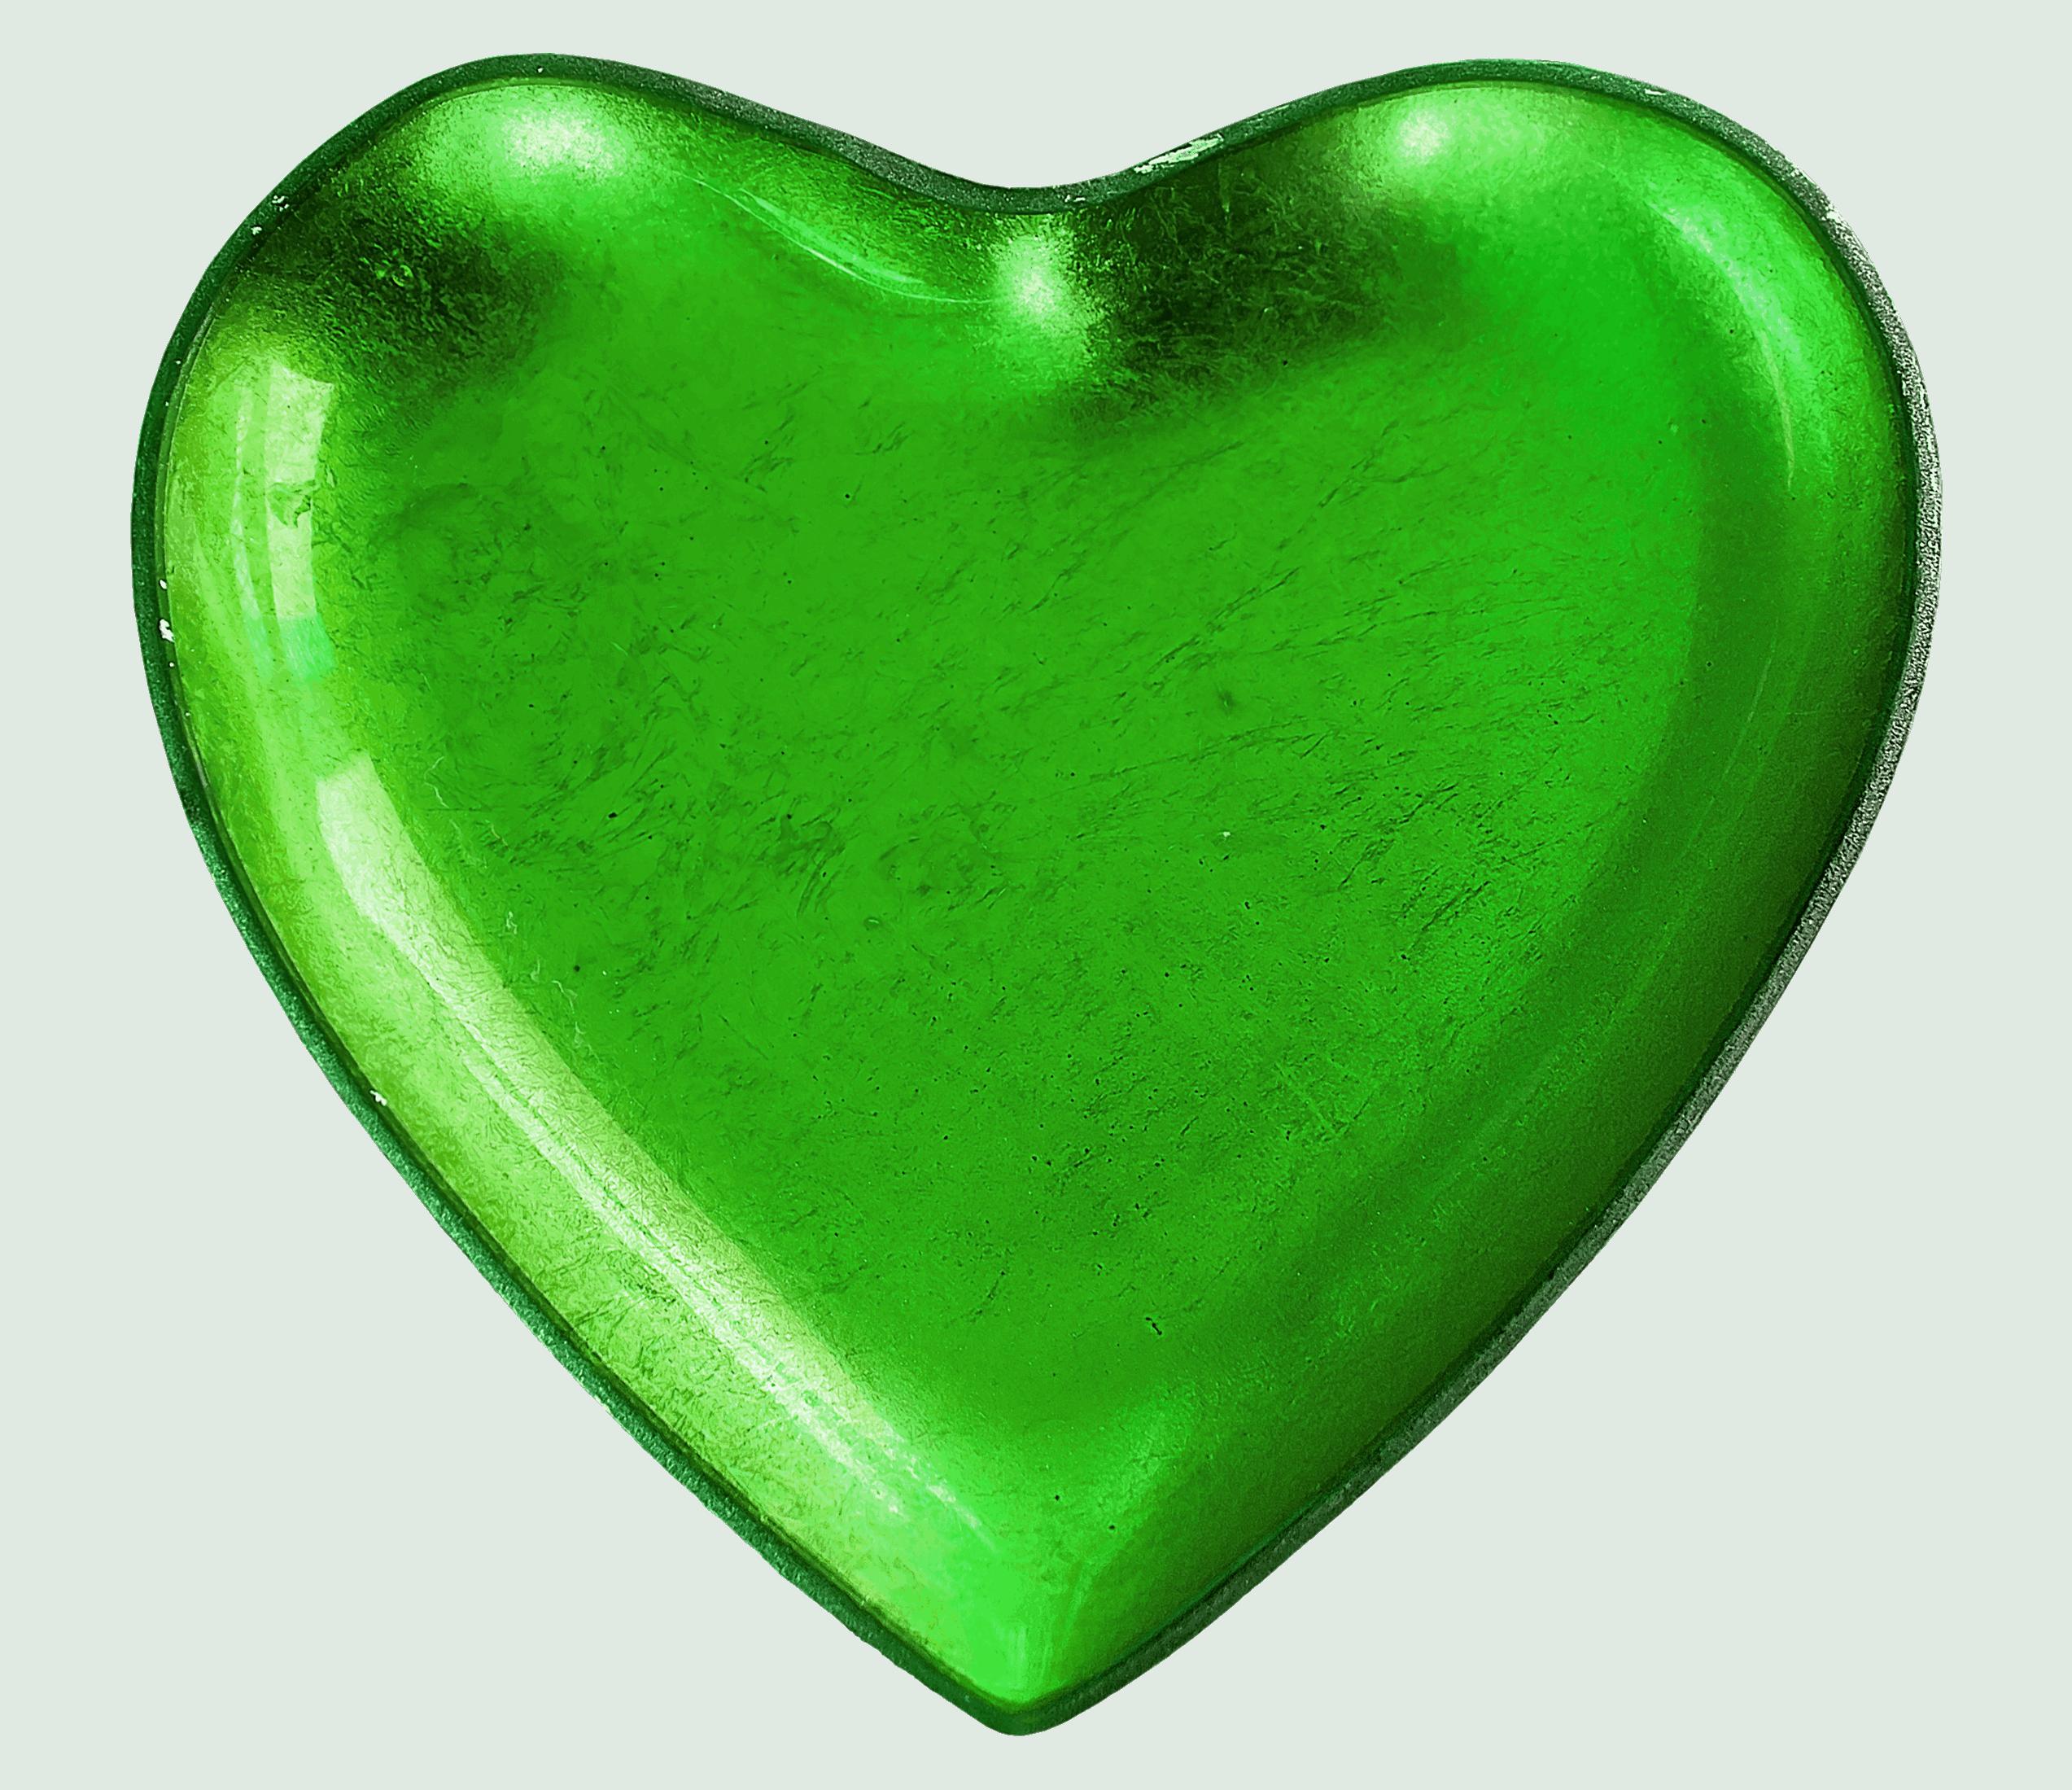 шапочка короткие картинки сердечки зеленые балконе стоят гигантские